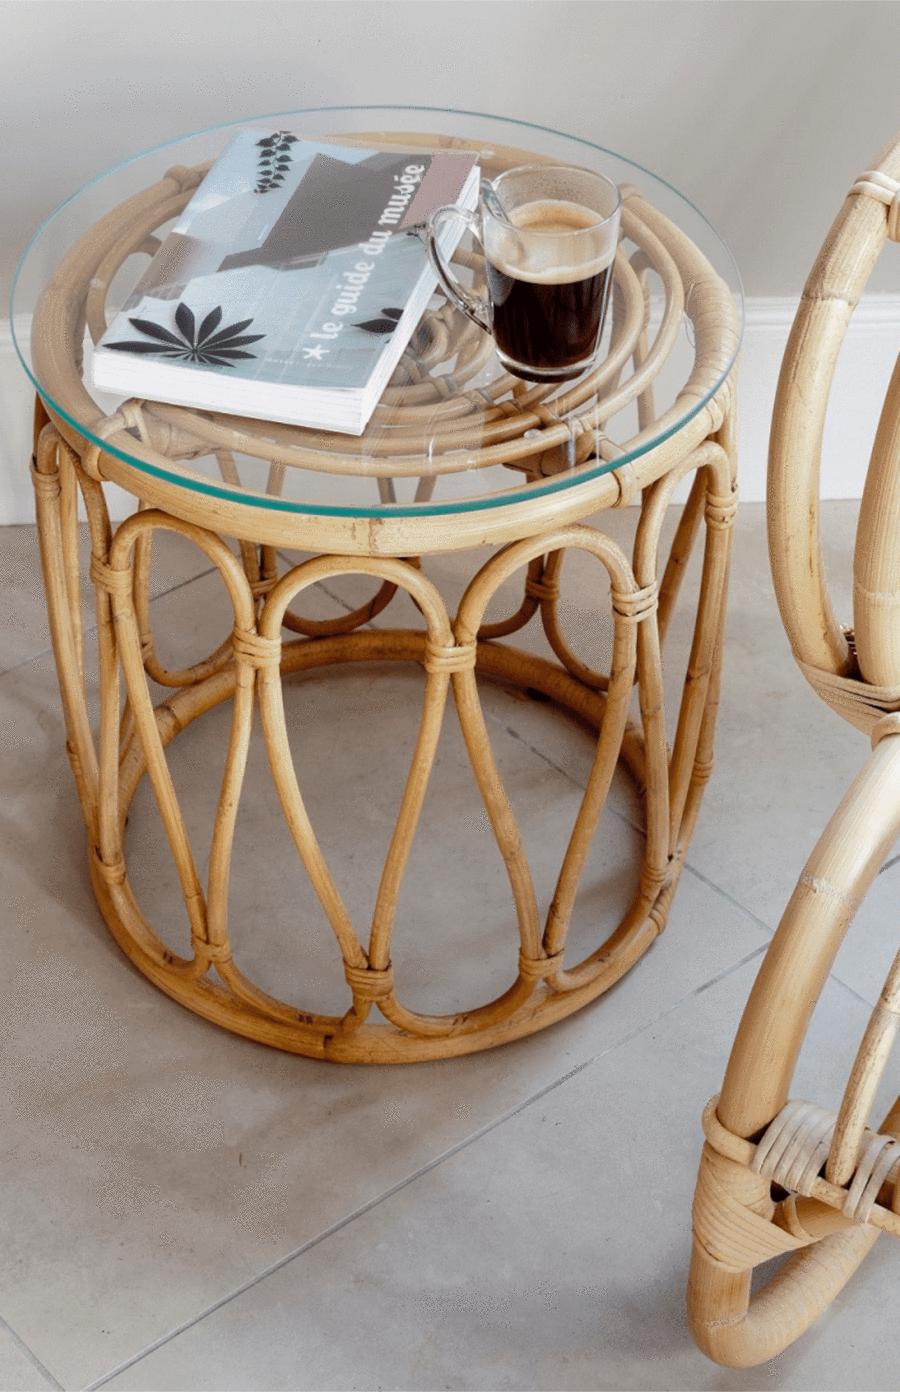 Kok Maison Diabolo Natural Rattan Round Table Natural The Modern Nursery Rattan Bedroom Rattan Diy Furniture Bedroom [ 1392 x 900 Pixel ]